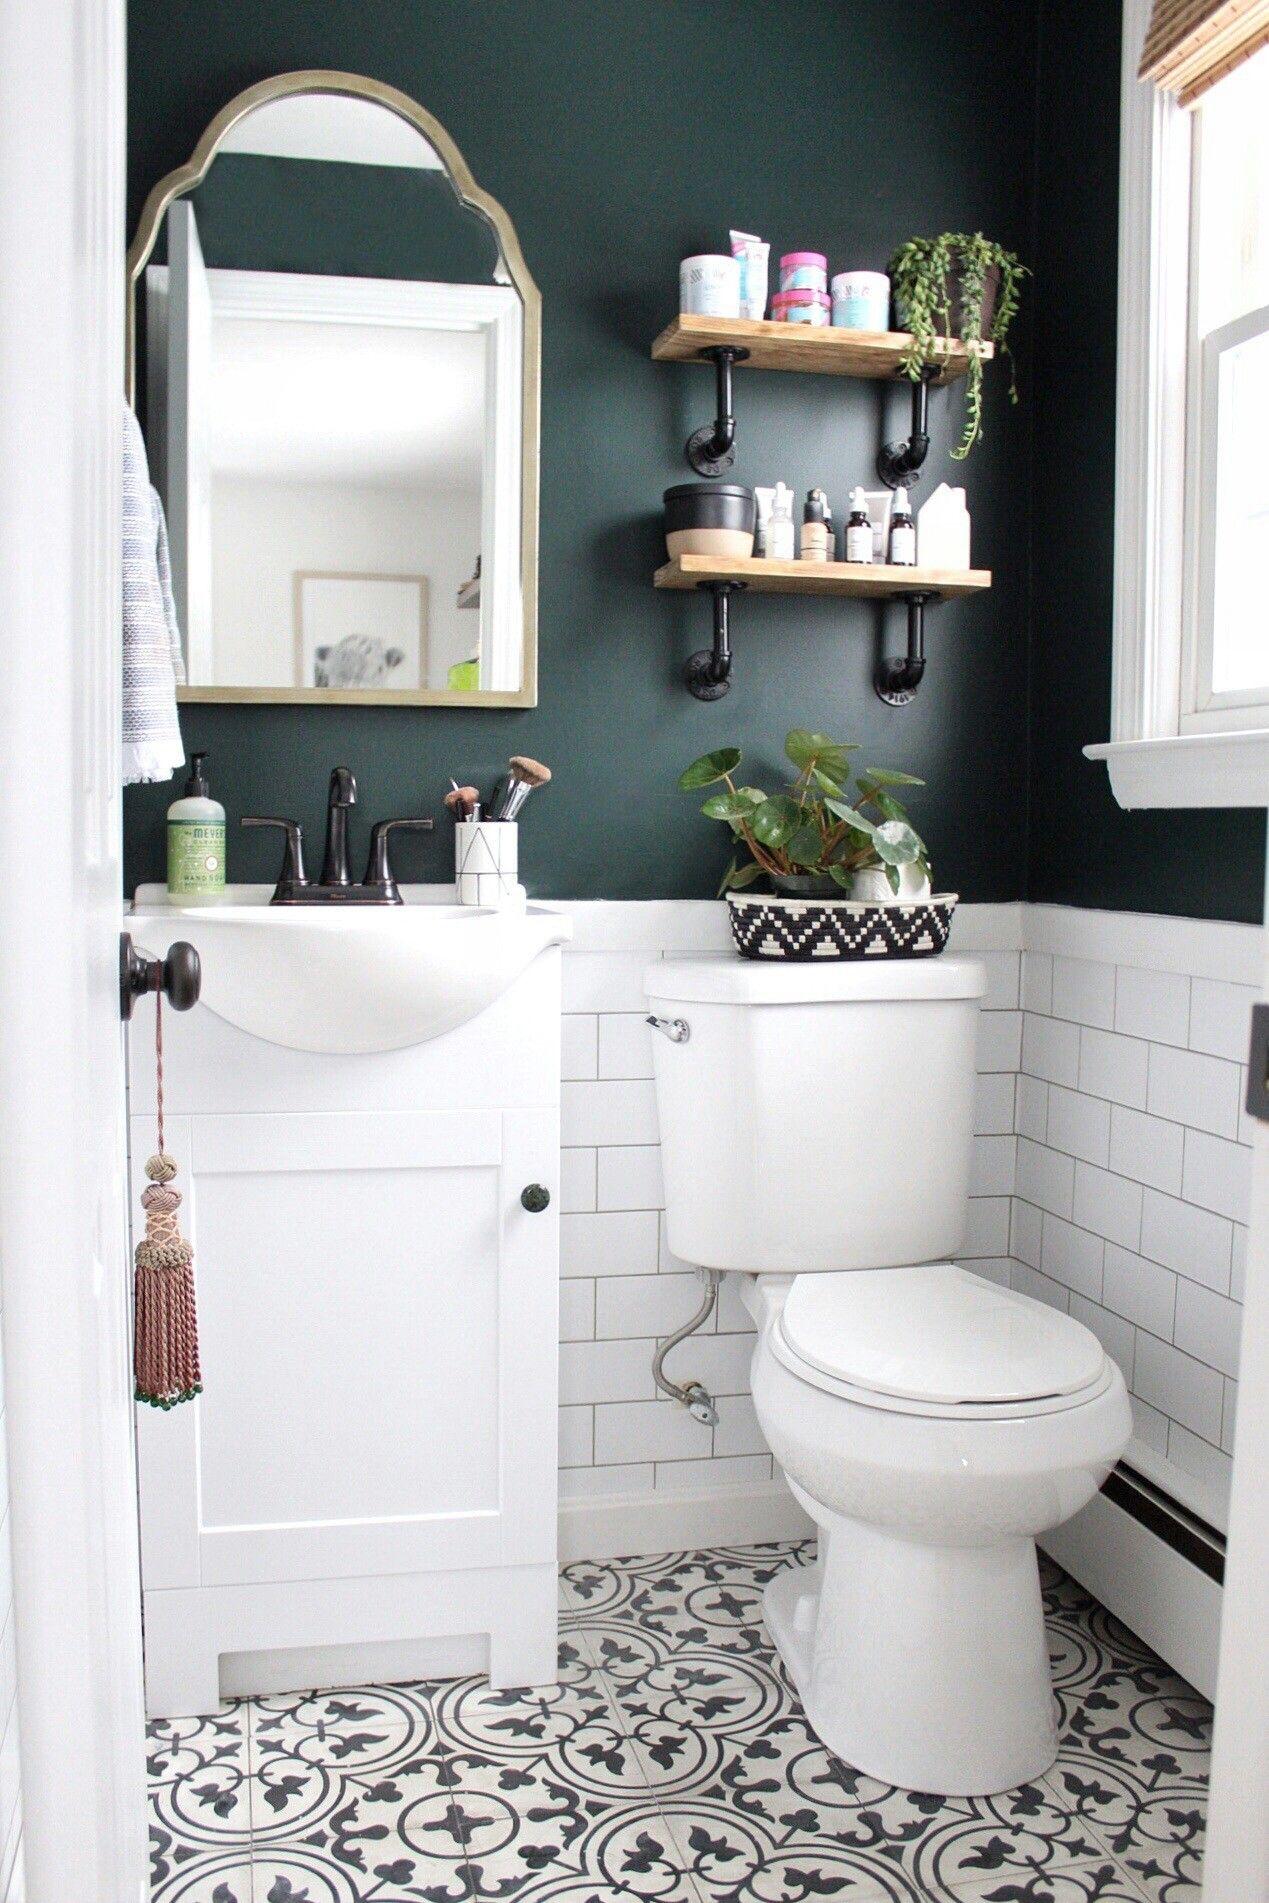 Pin By Julia Mvp On Bathroom Small Bathroom Bathrooms Remodel Painting Bathroom